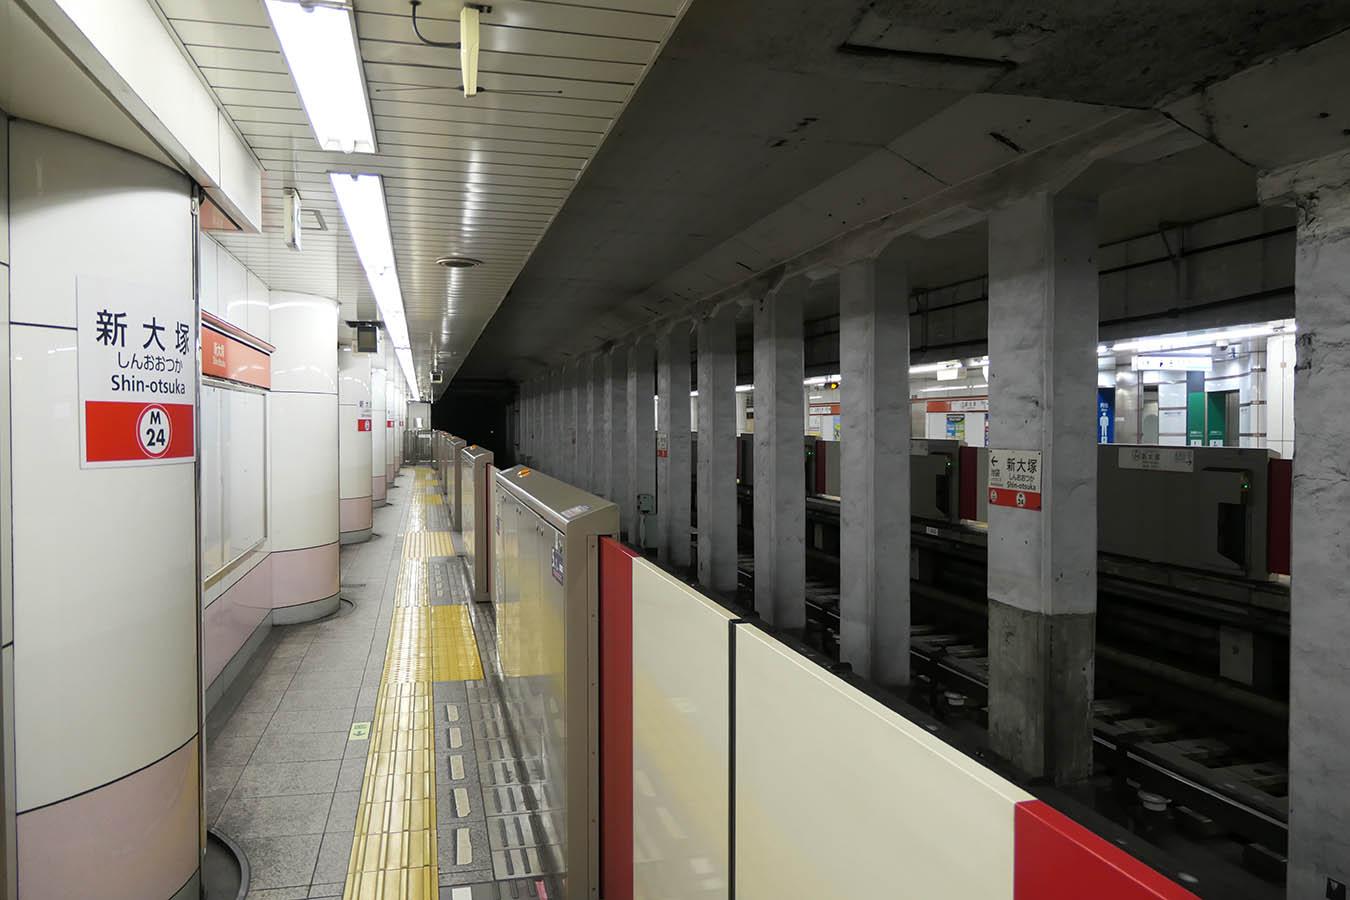 M24_photo04.jpg